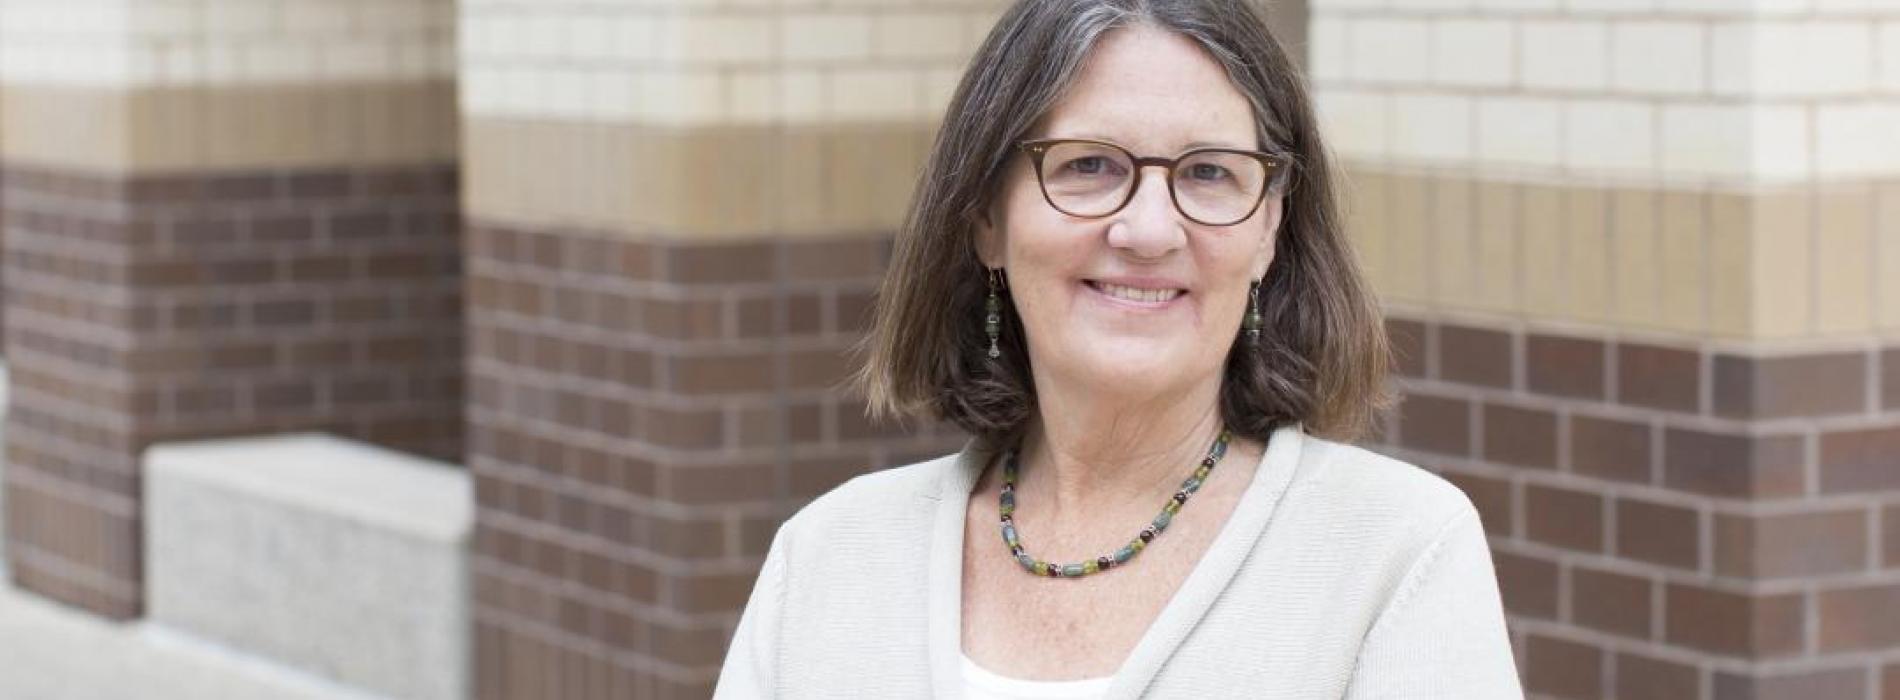 Photo of interim dean Mona Lynch